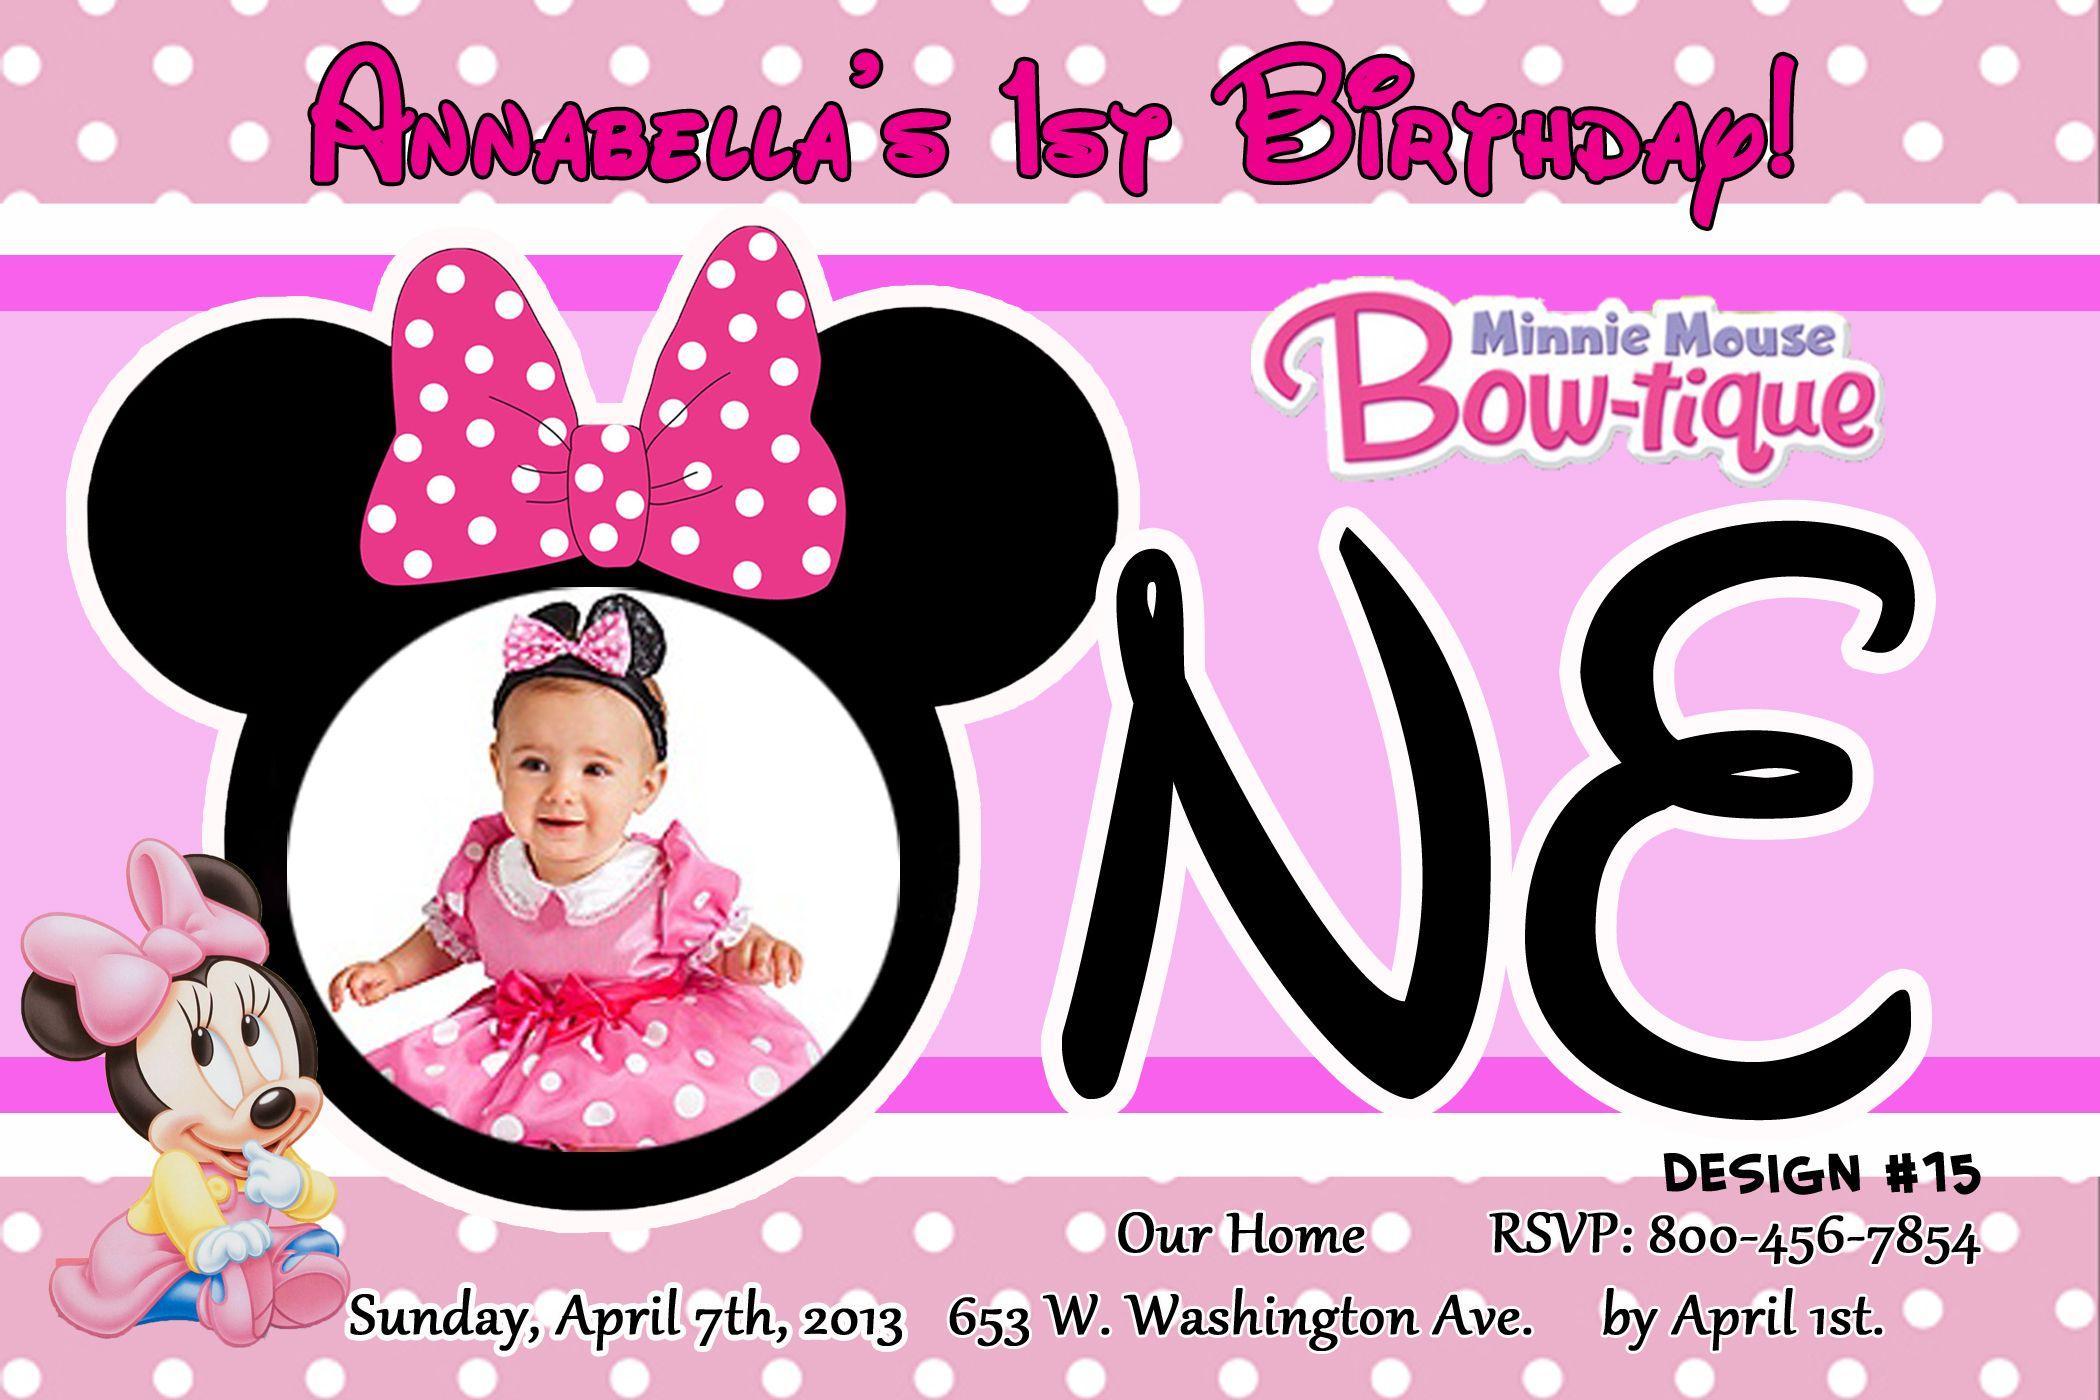 Minnie Mouse 1st Birthday Invitations   Minnie Mouse Birthday ...